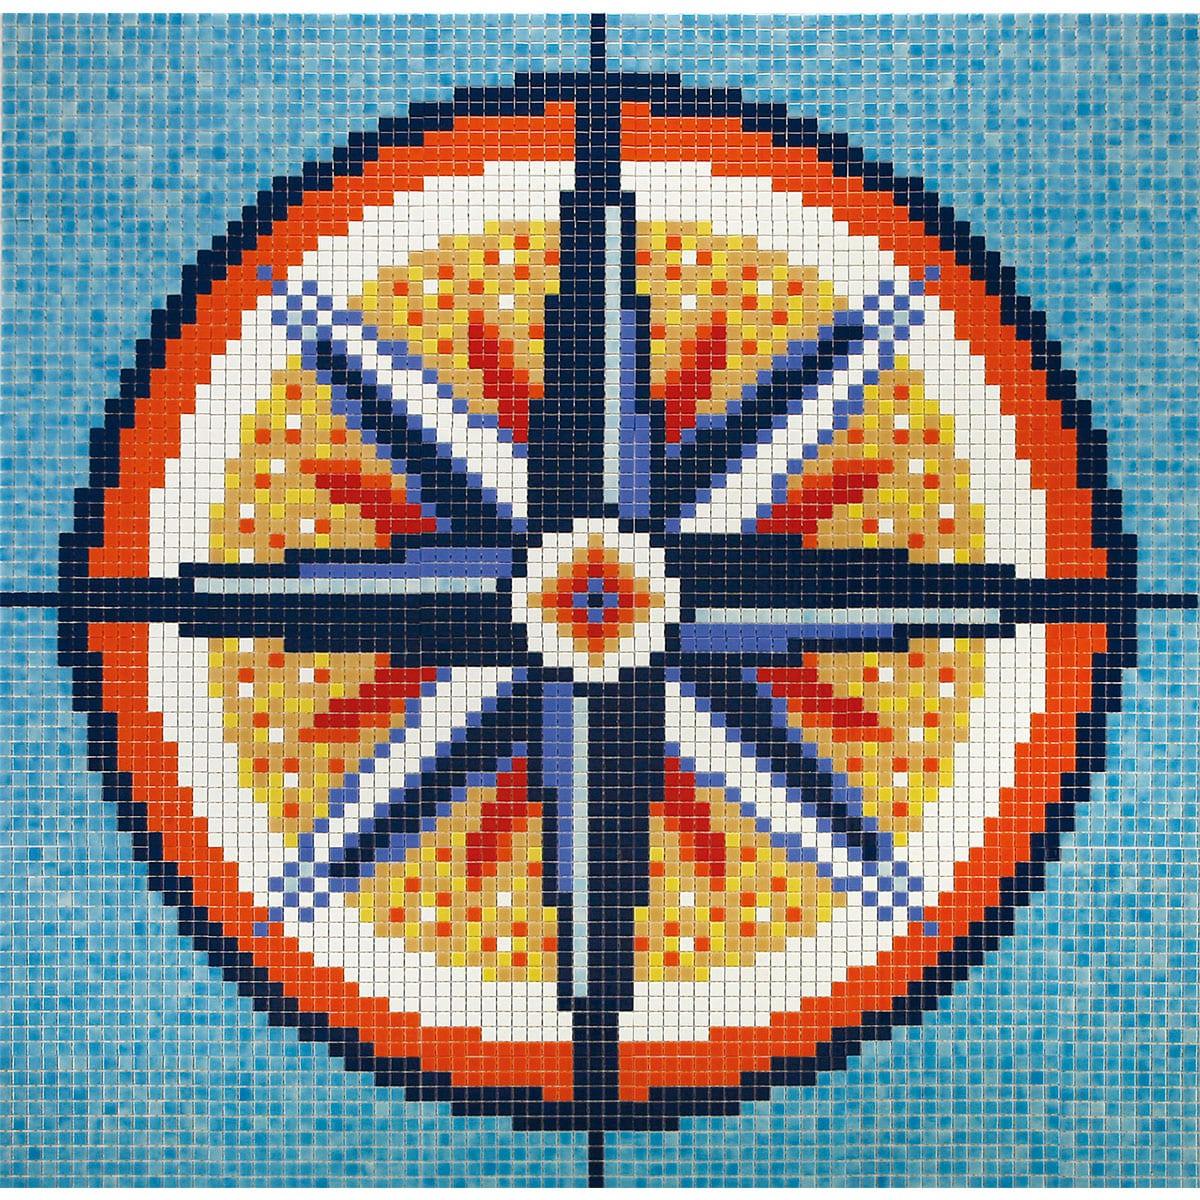 D-18-2,06-x-2,06-m-DIBUJOS-Mosaic-Ezarri.jpg